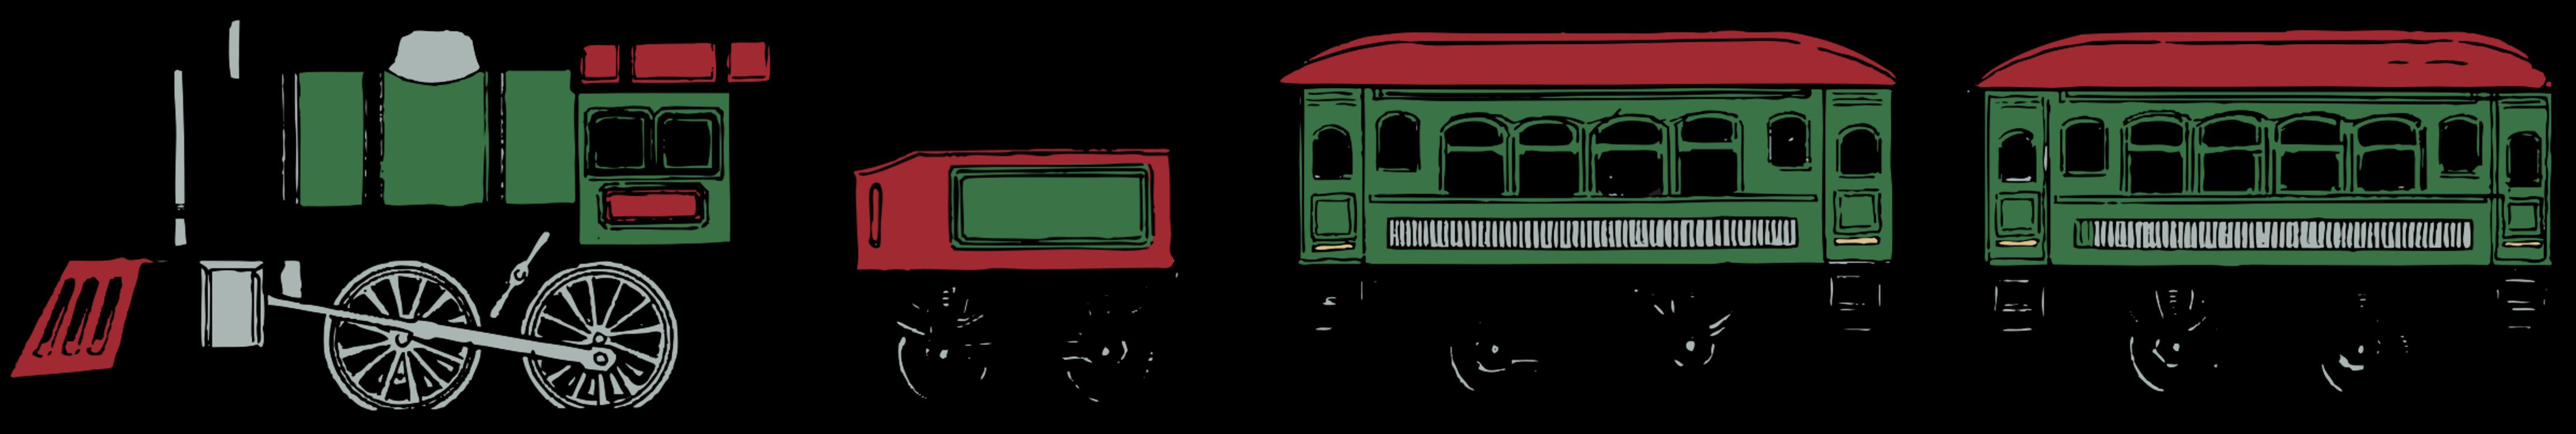 Facade,Train,Rail Transport